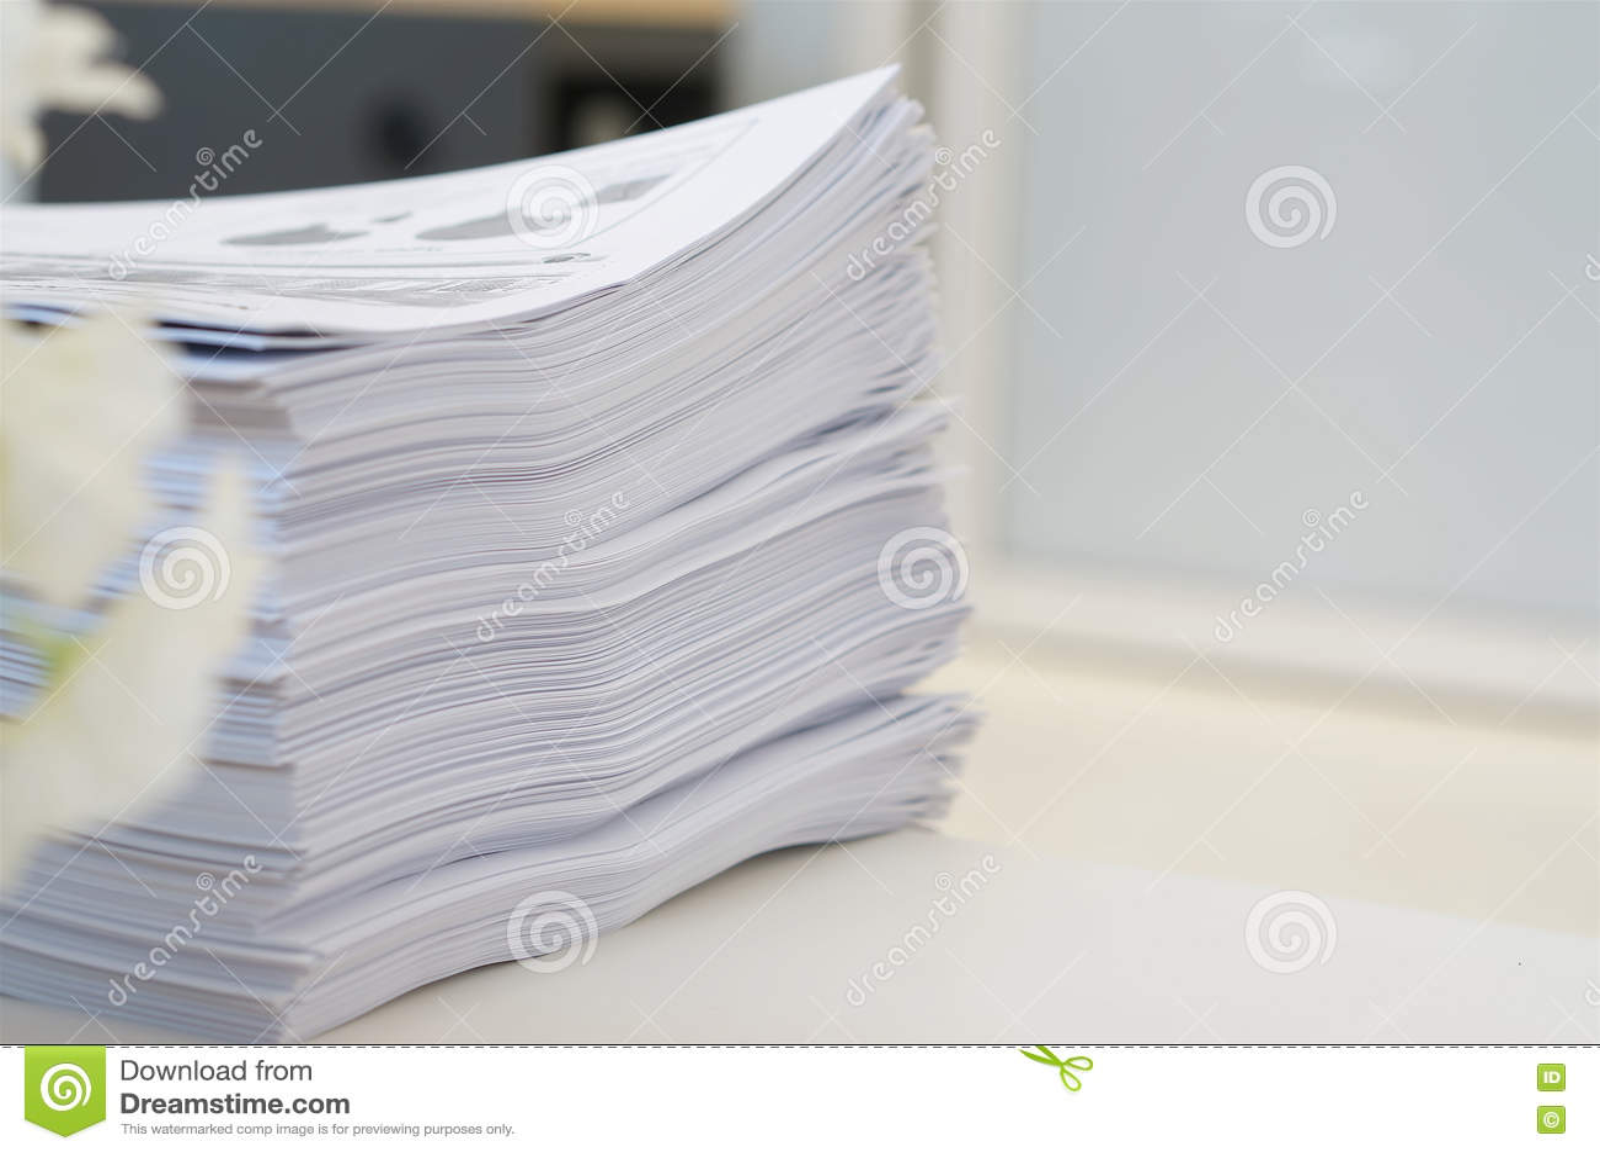 Stapel Papierarbeit im Büro